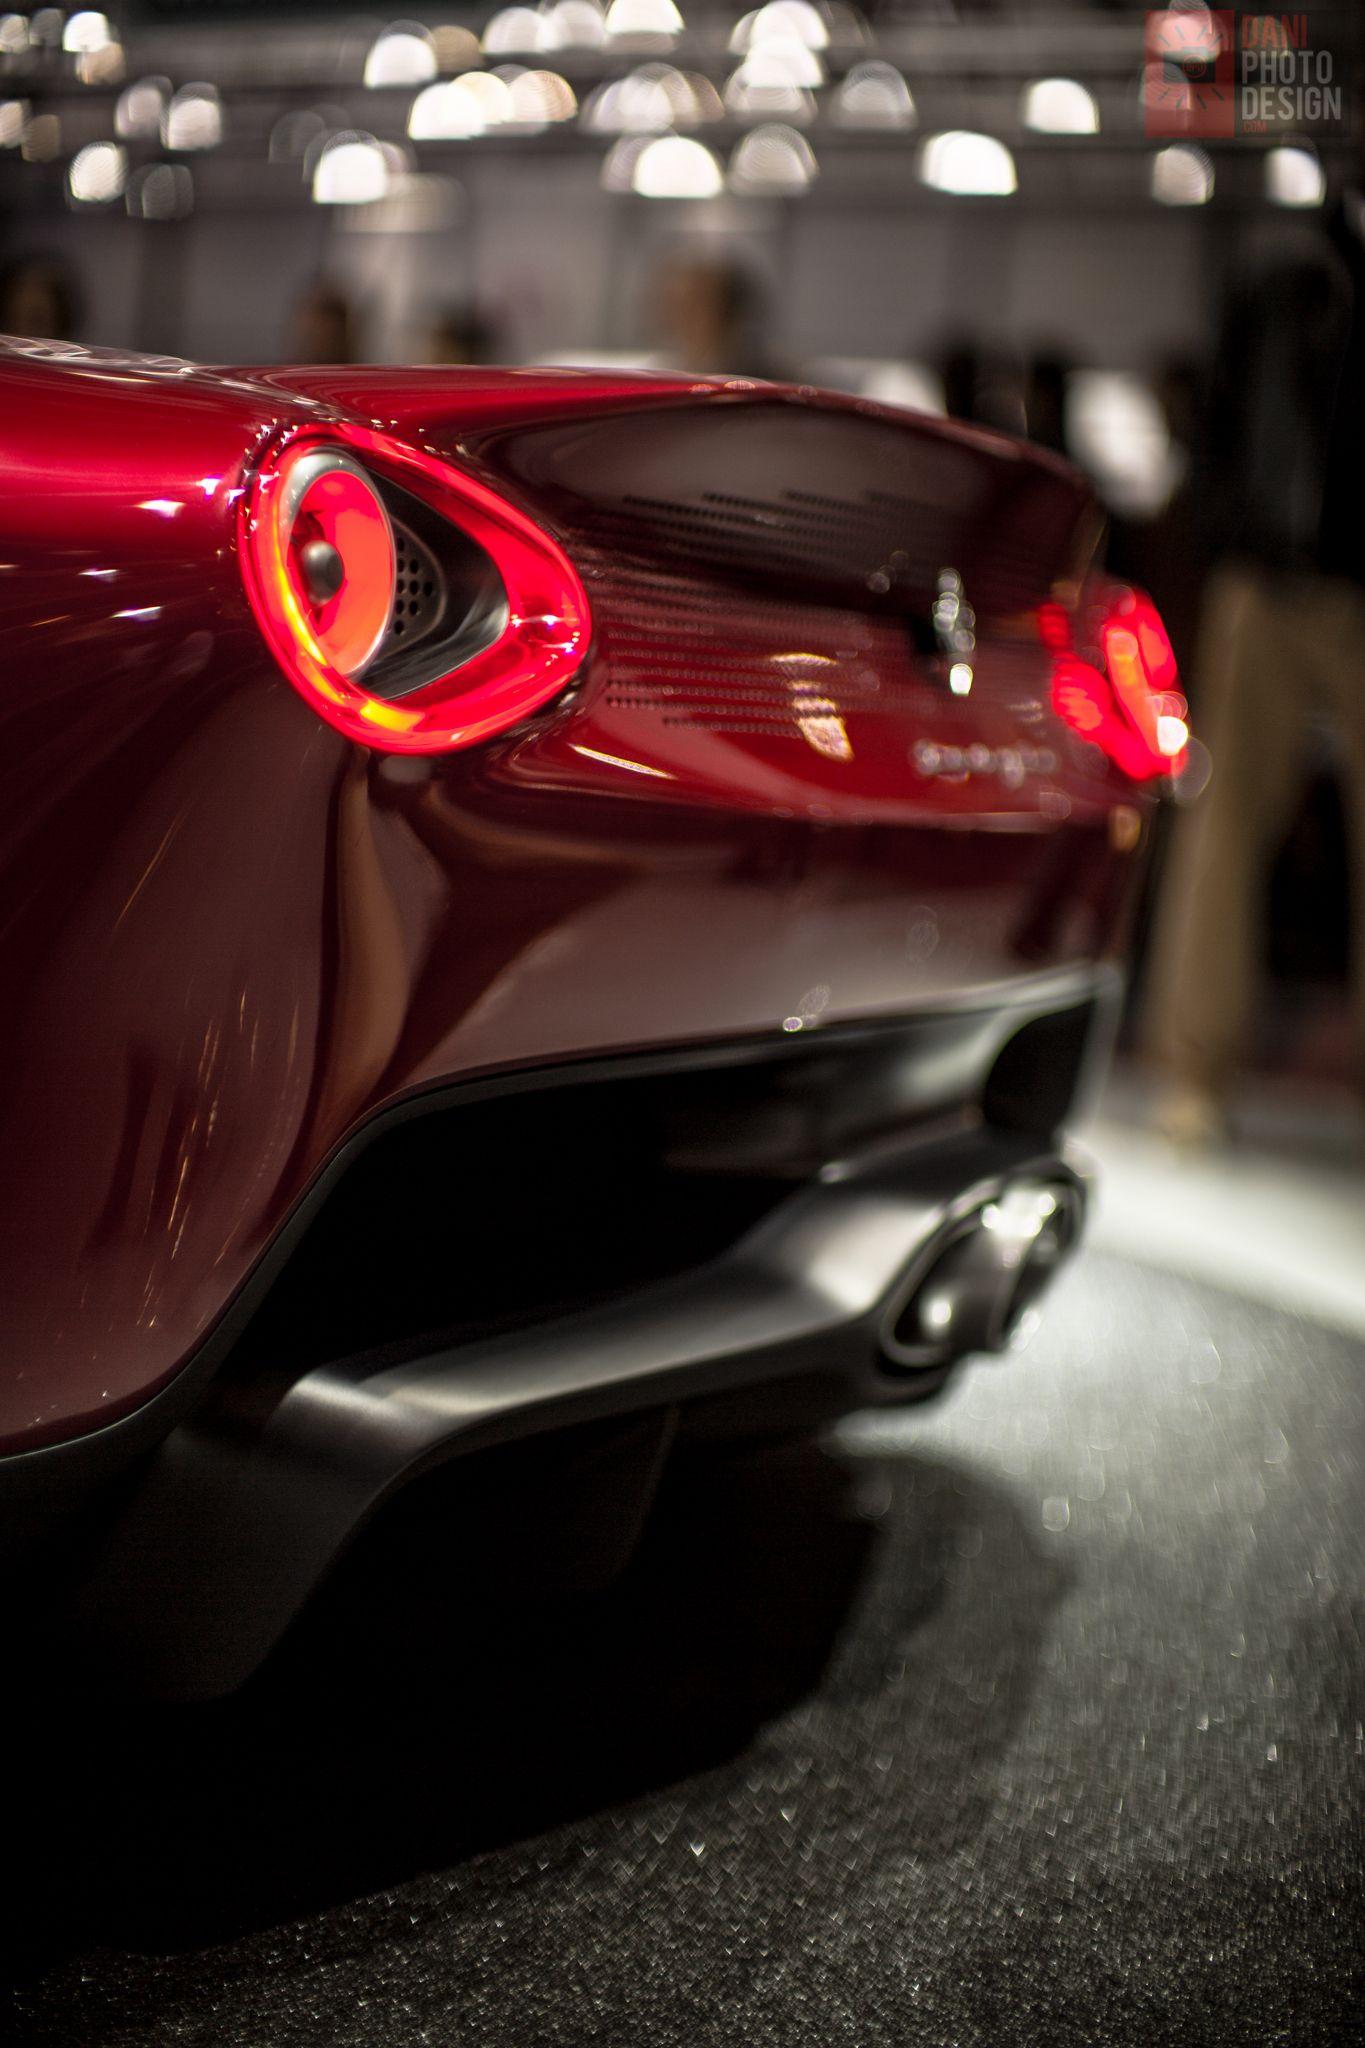 Lake Elsinore Dodge >> Cars - Pininfarina Concept Ferrari Sergio - daniphotodesign.com | Ferrari, Ferrari car, Cars